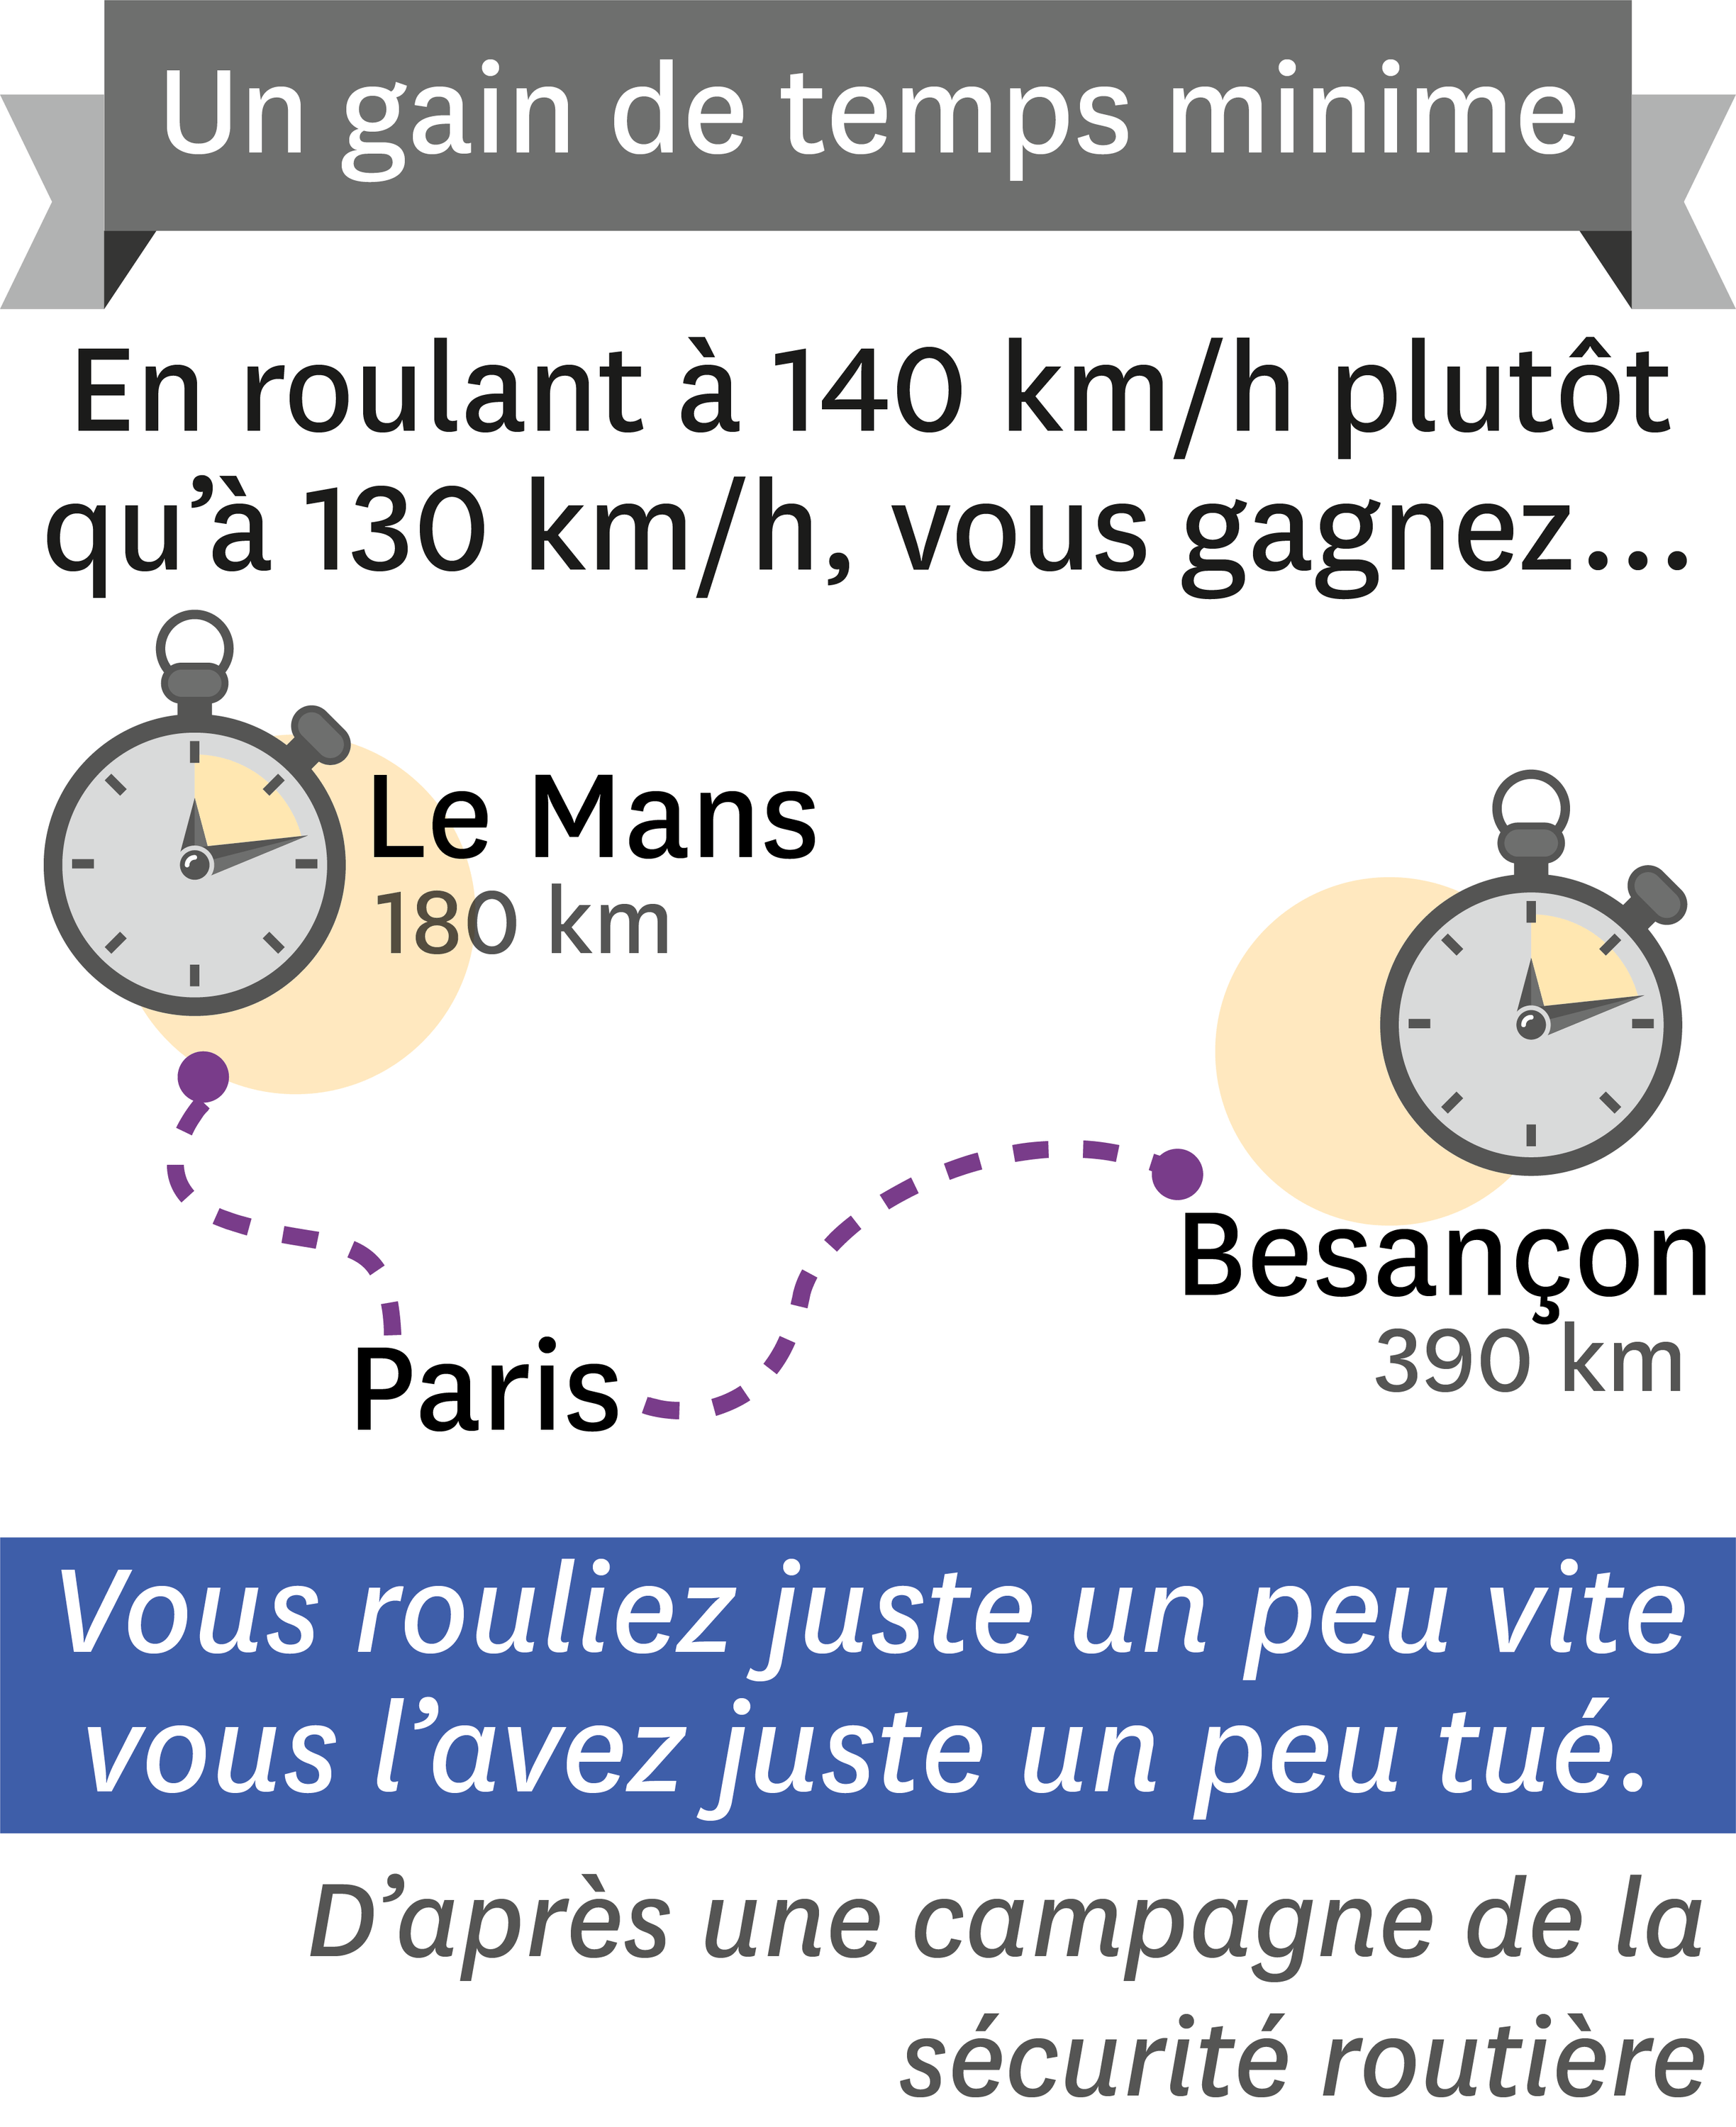 <stamp theme='pc-green1'>Doc. 2</stamp> Le Mans - Paris - Besançon.